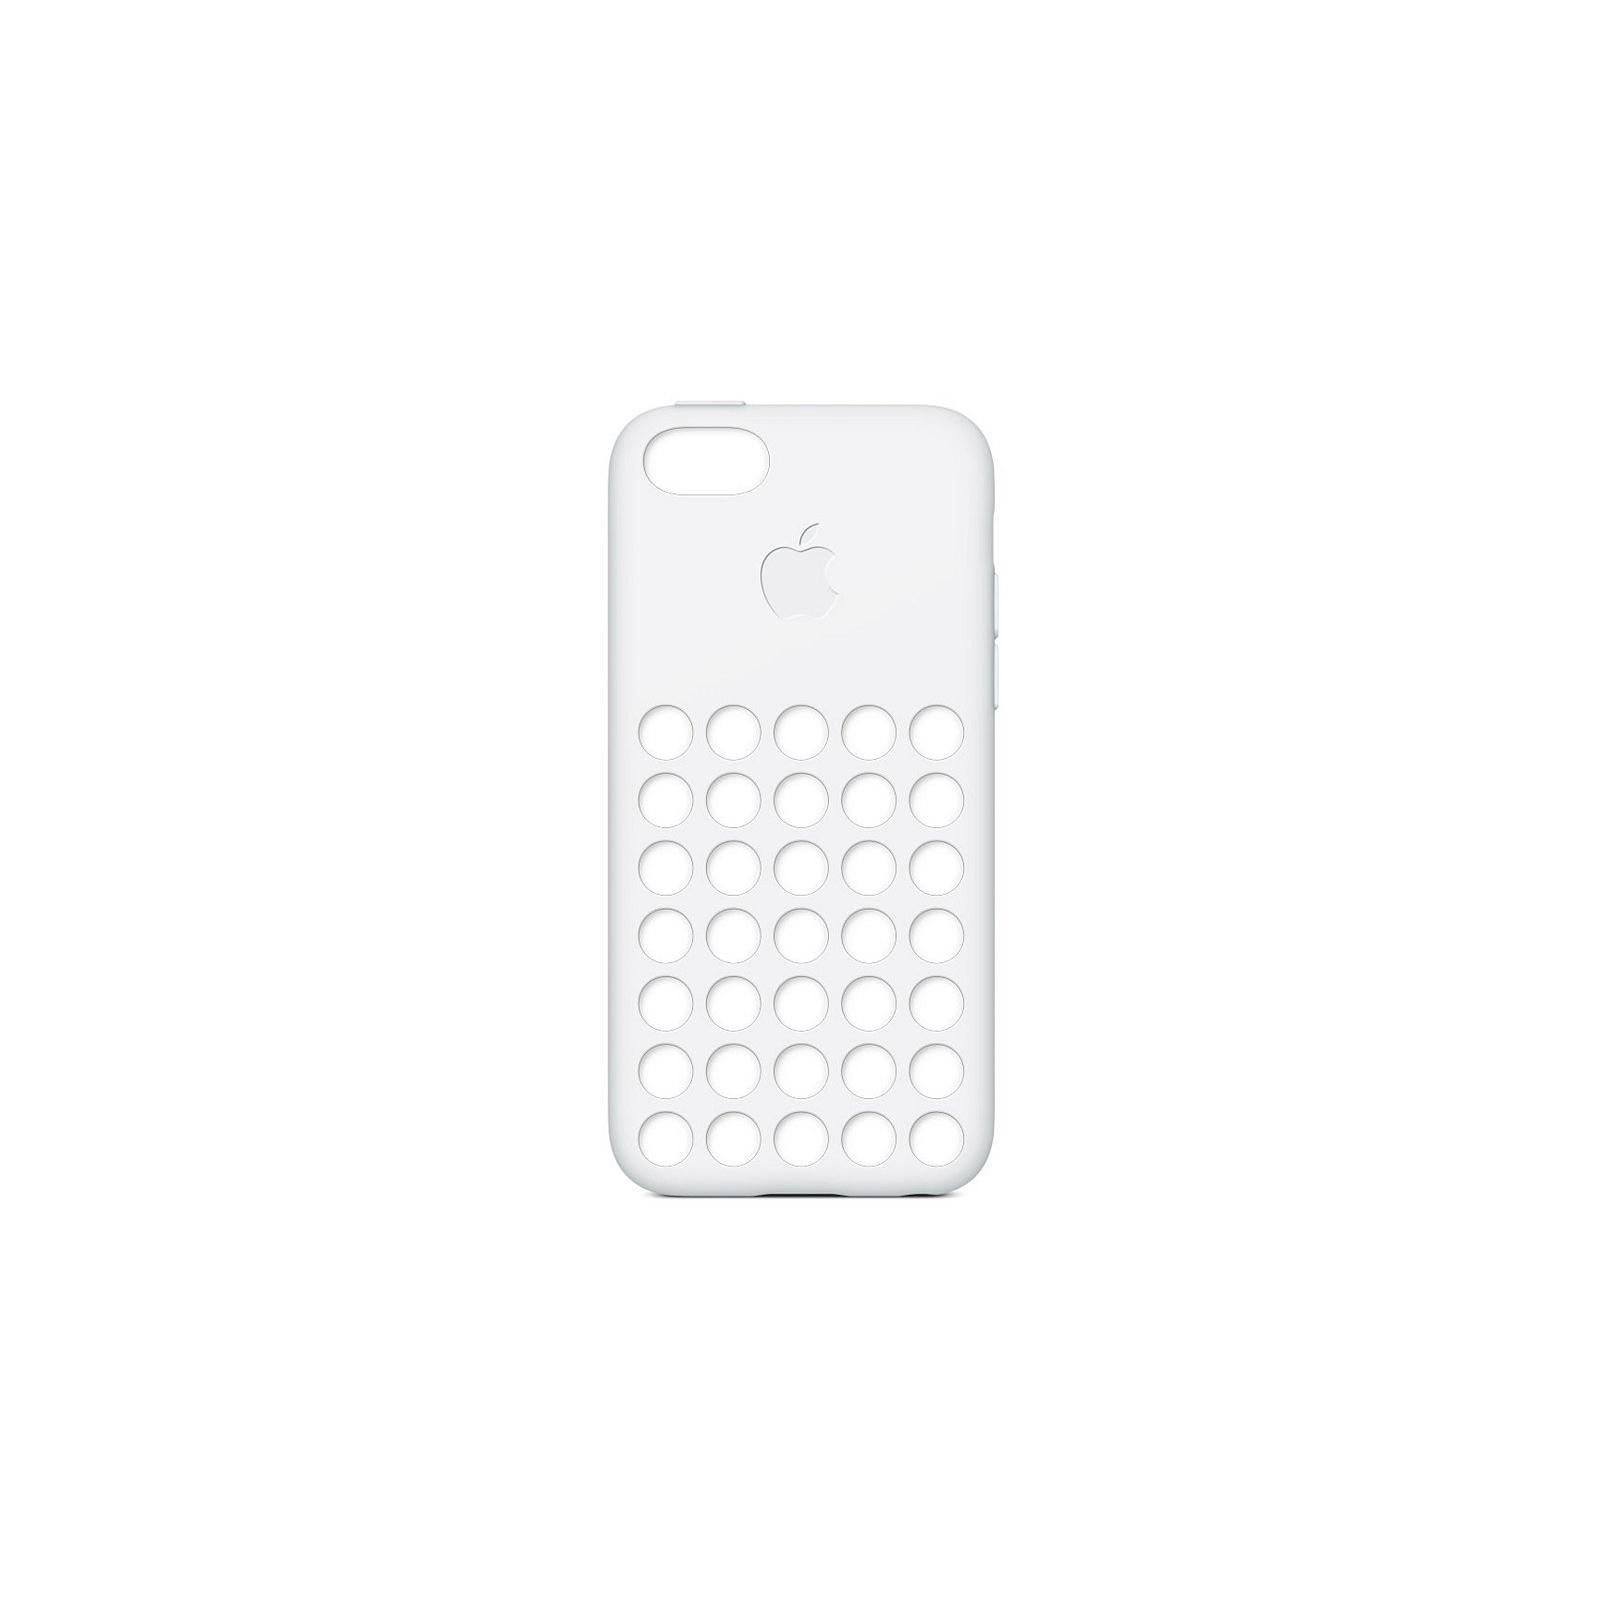 Чехол для моб. телефона Apple для iPhone 5c white (MF039ZM/A)